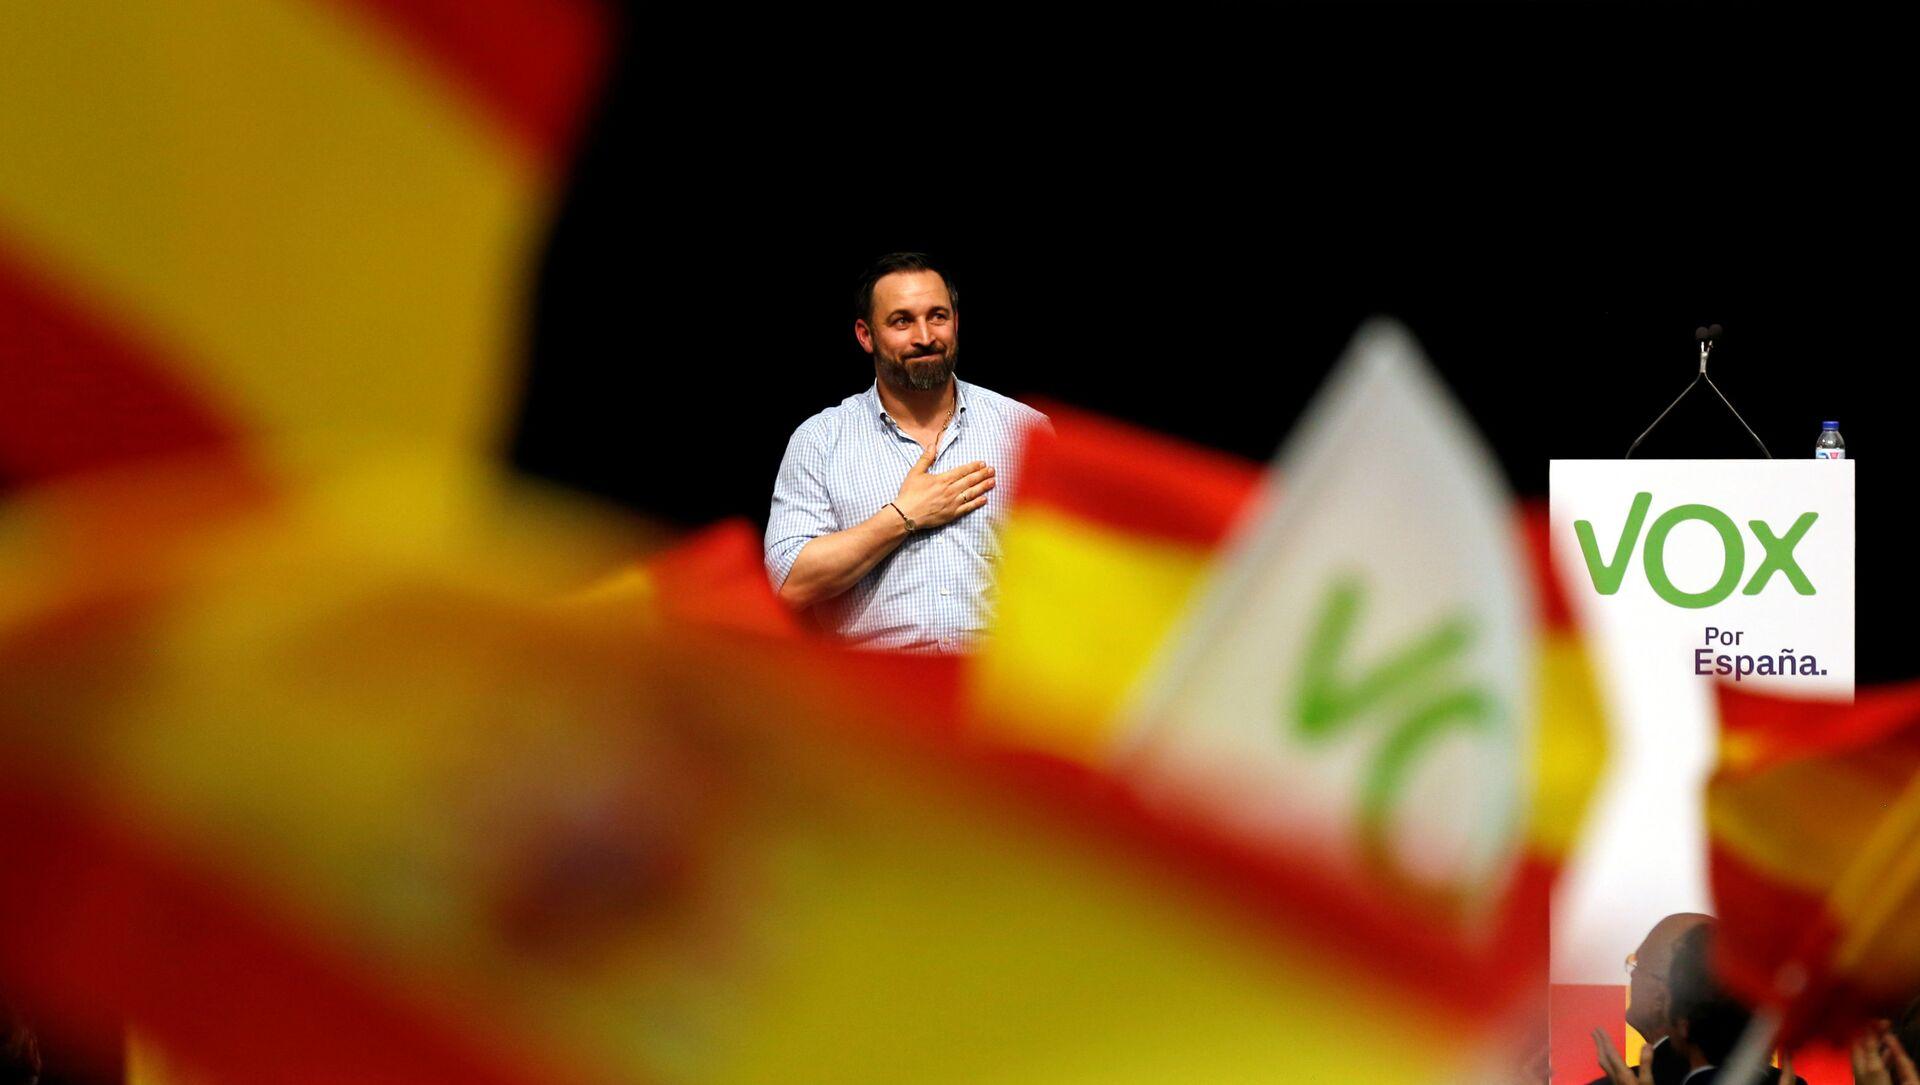 Santiago Abascal, lider del partido Vox - Sputnik Mundo, 1920, 27.04.2019